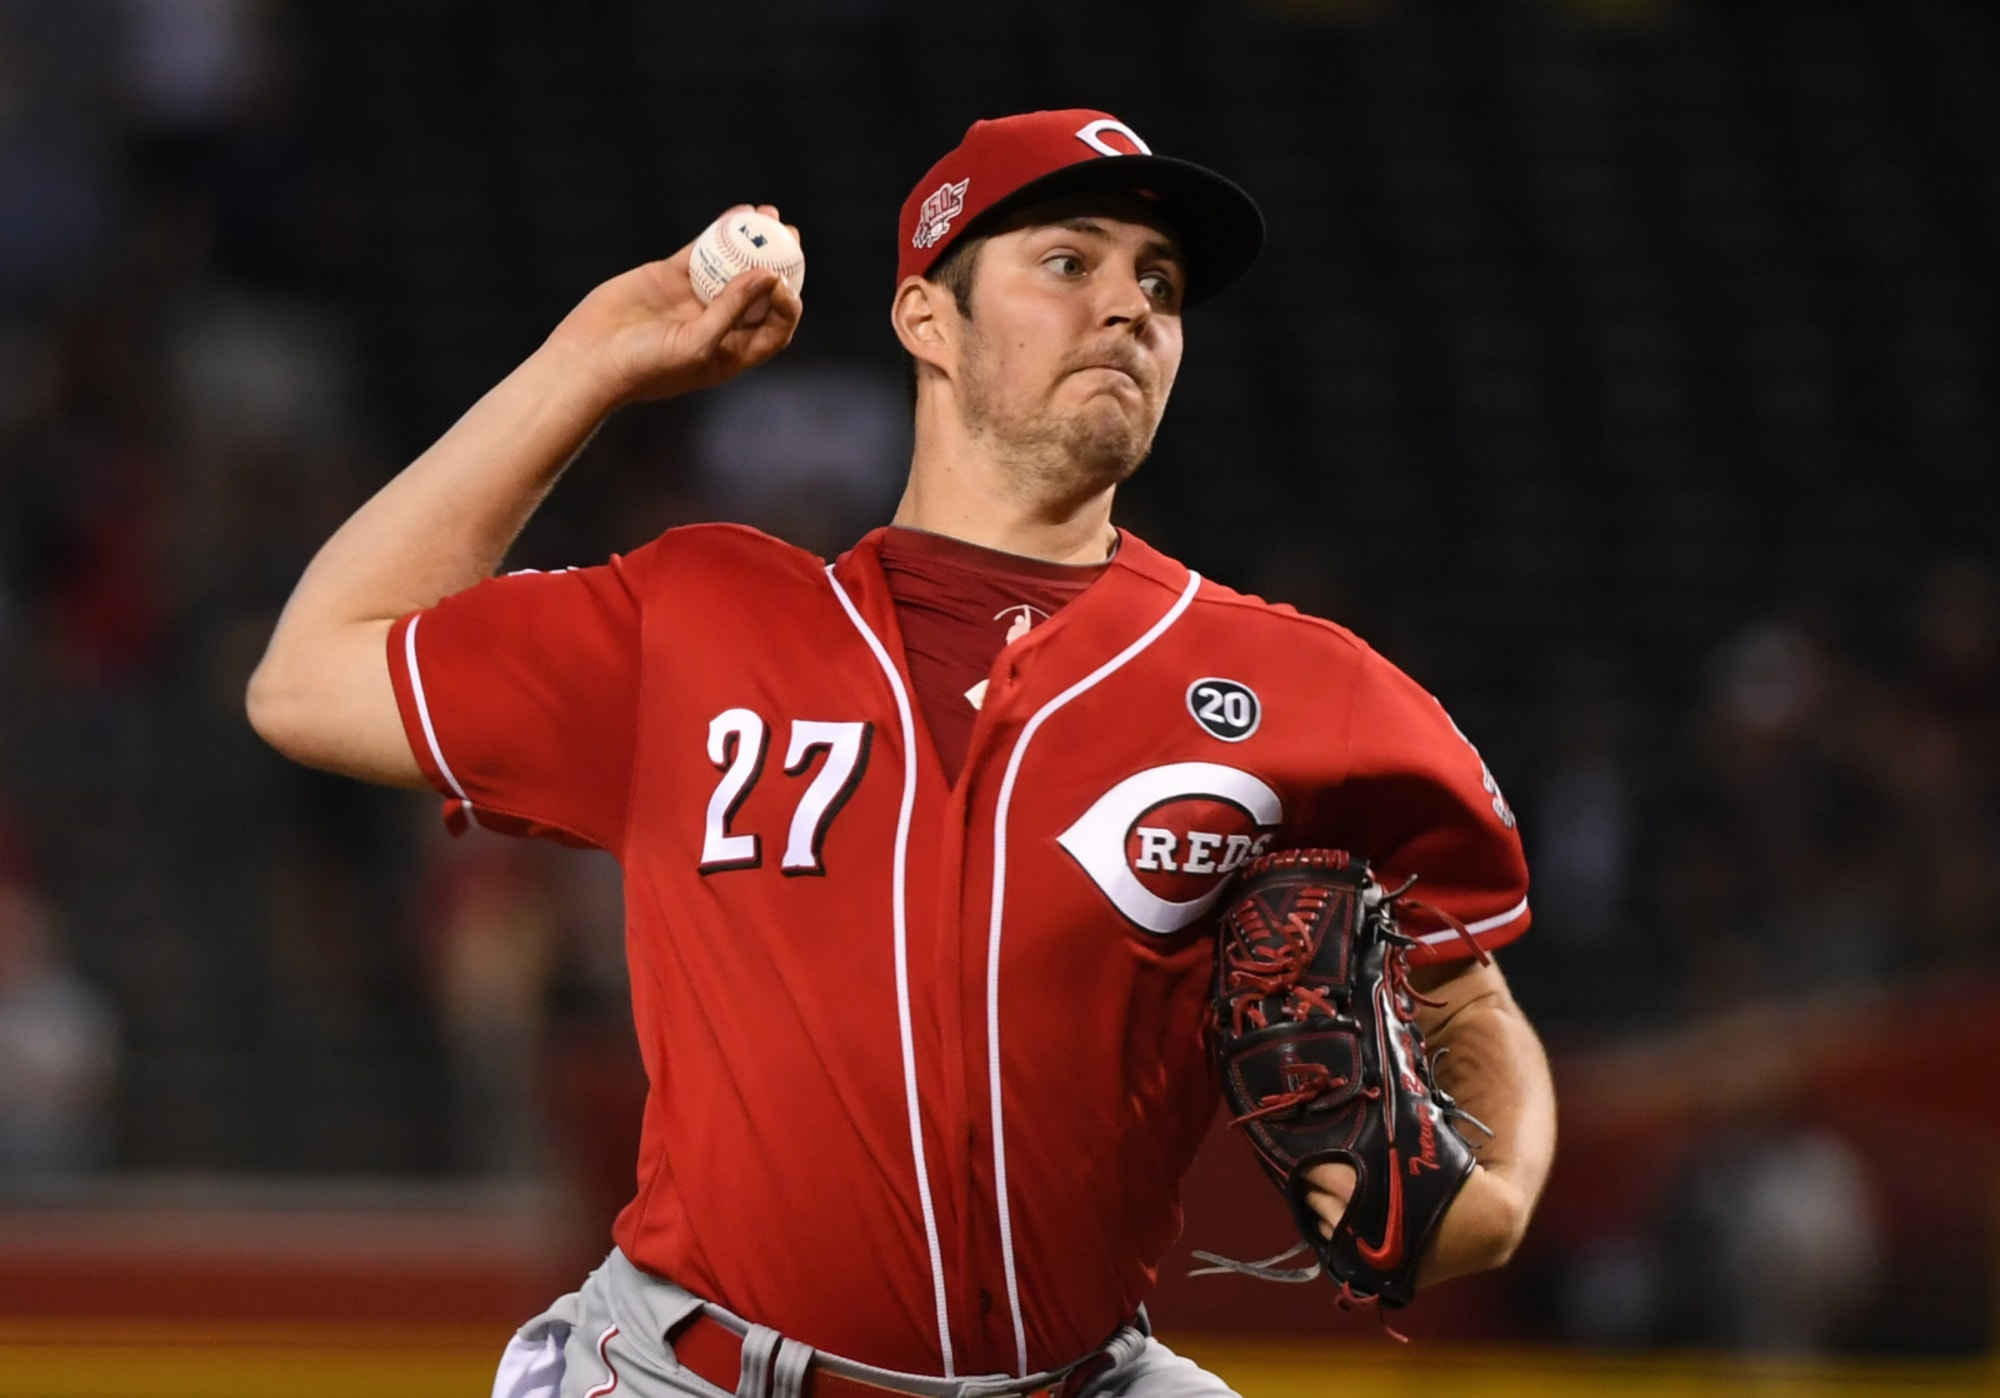 Cincinnati Reds: Trevor Bauer should get his way and pitch on 3 days rest